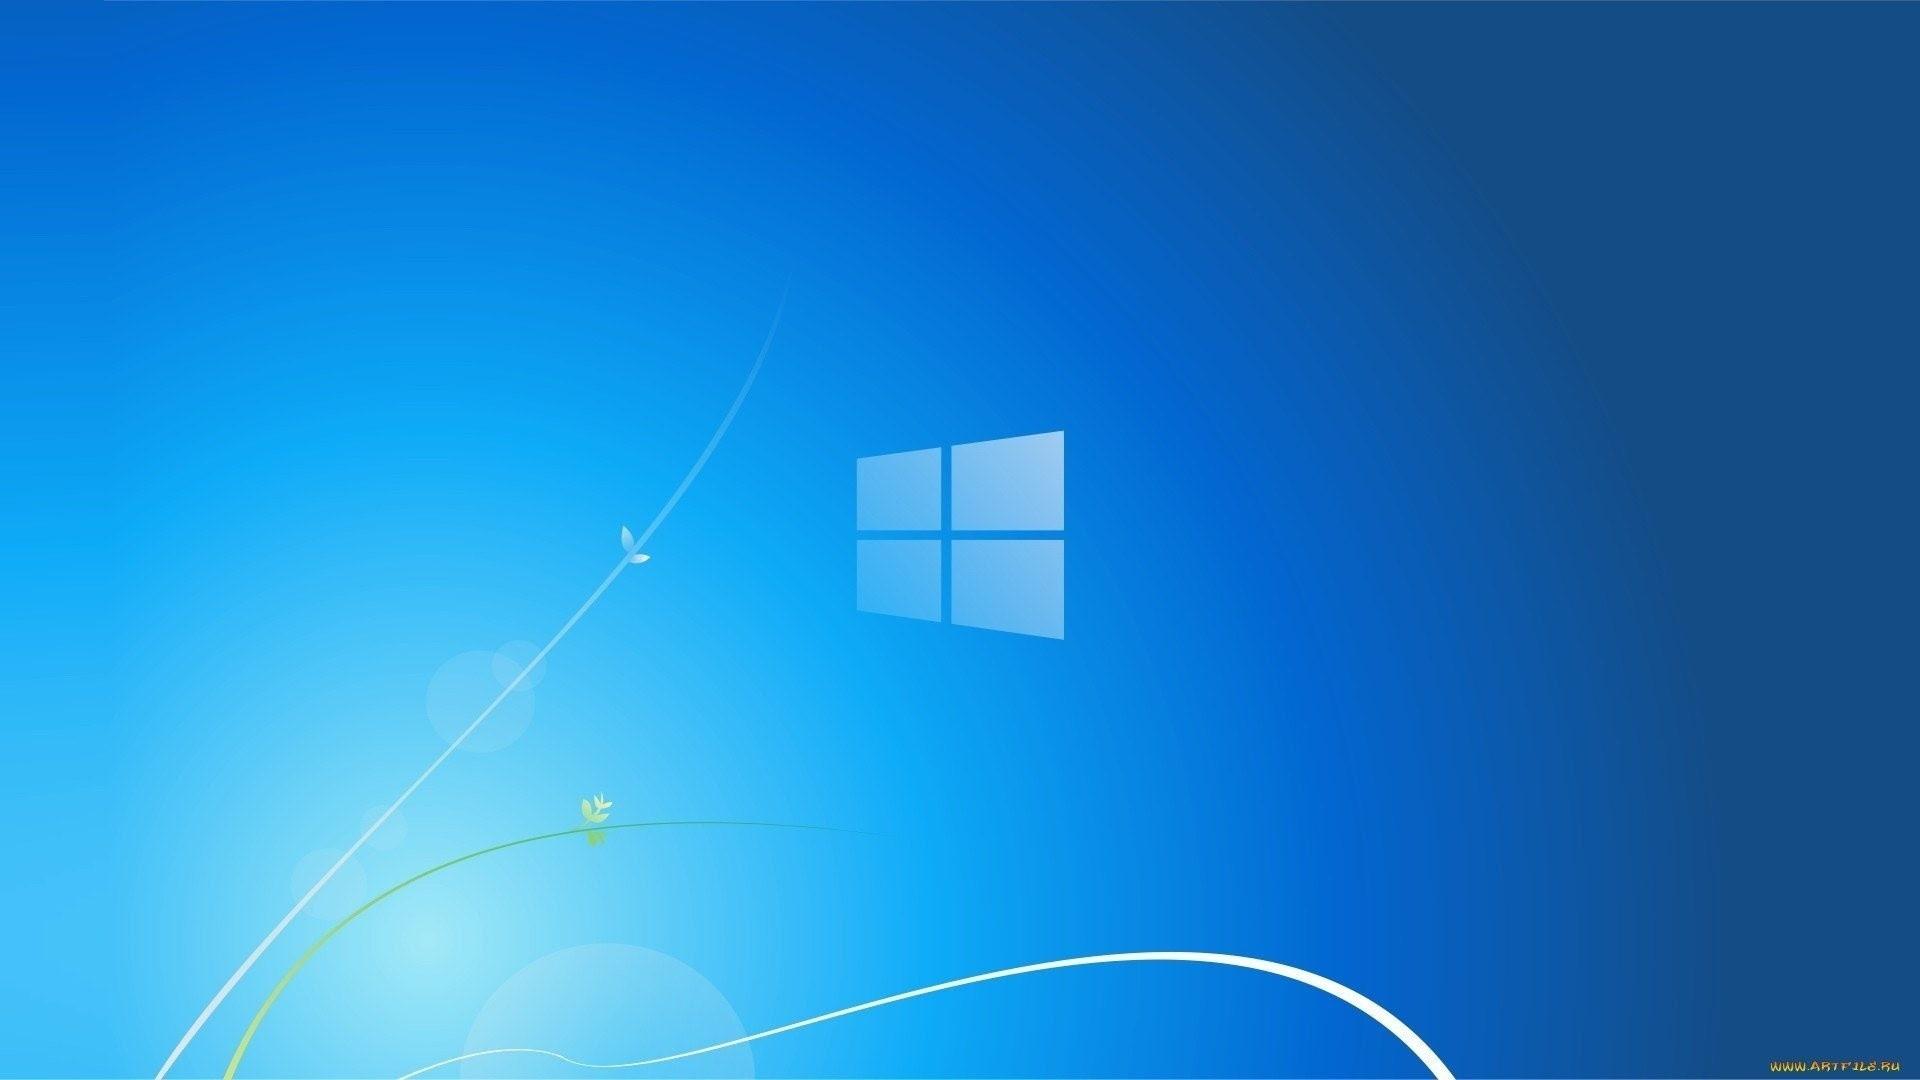 Windows Desktop Backgrounds Desktop Backgrounds For Windows 8